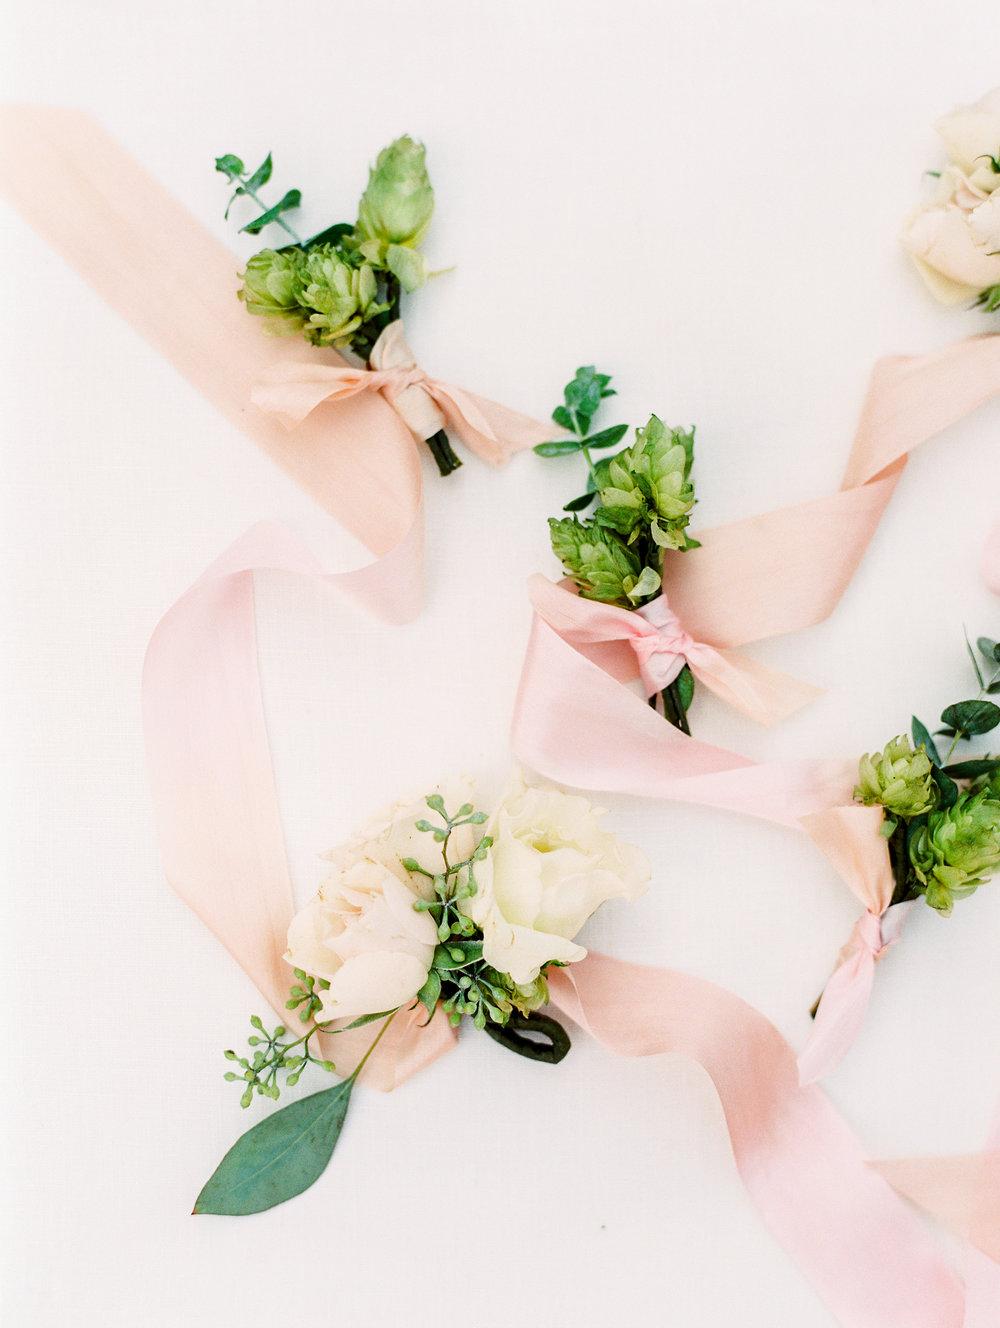 Zoller+Wedding+Details-14.jpg